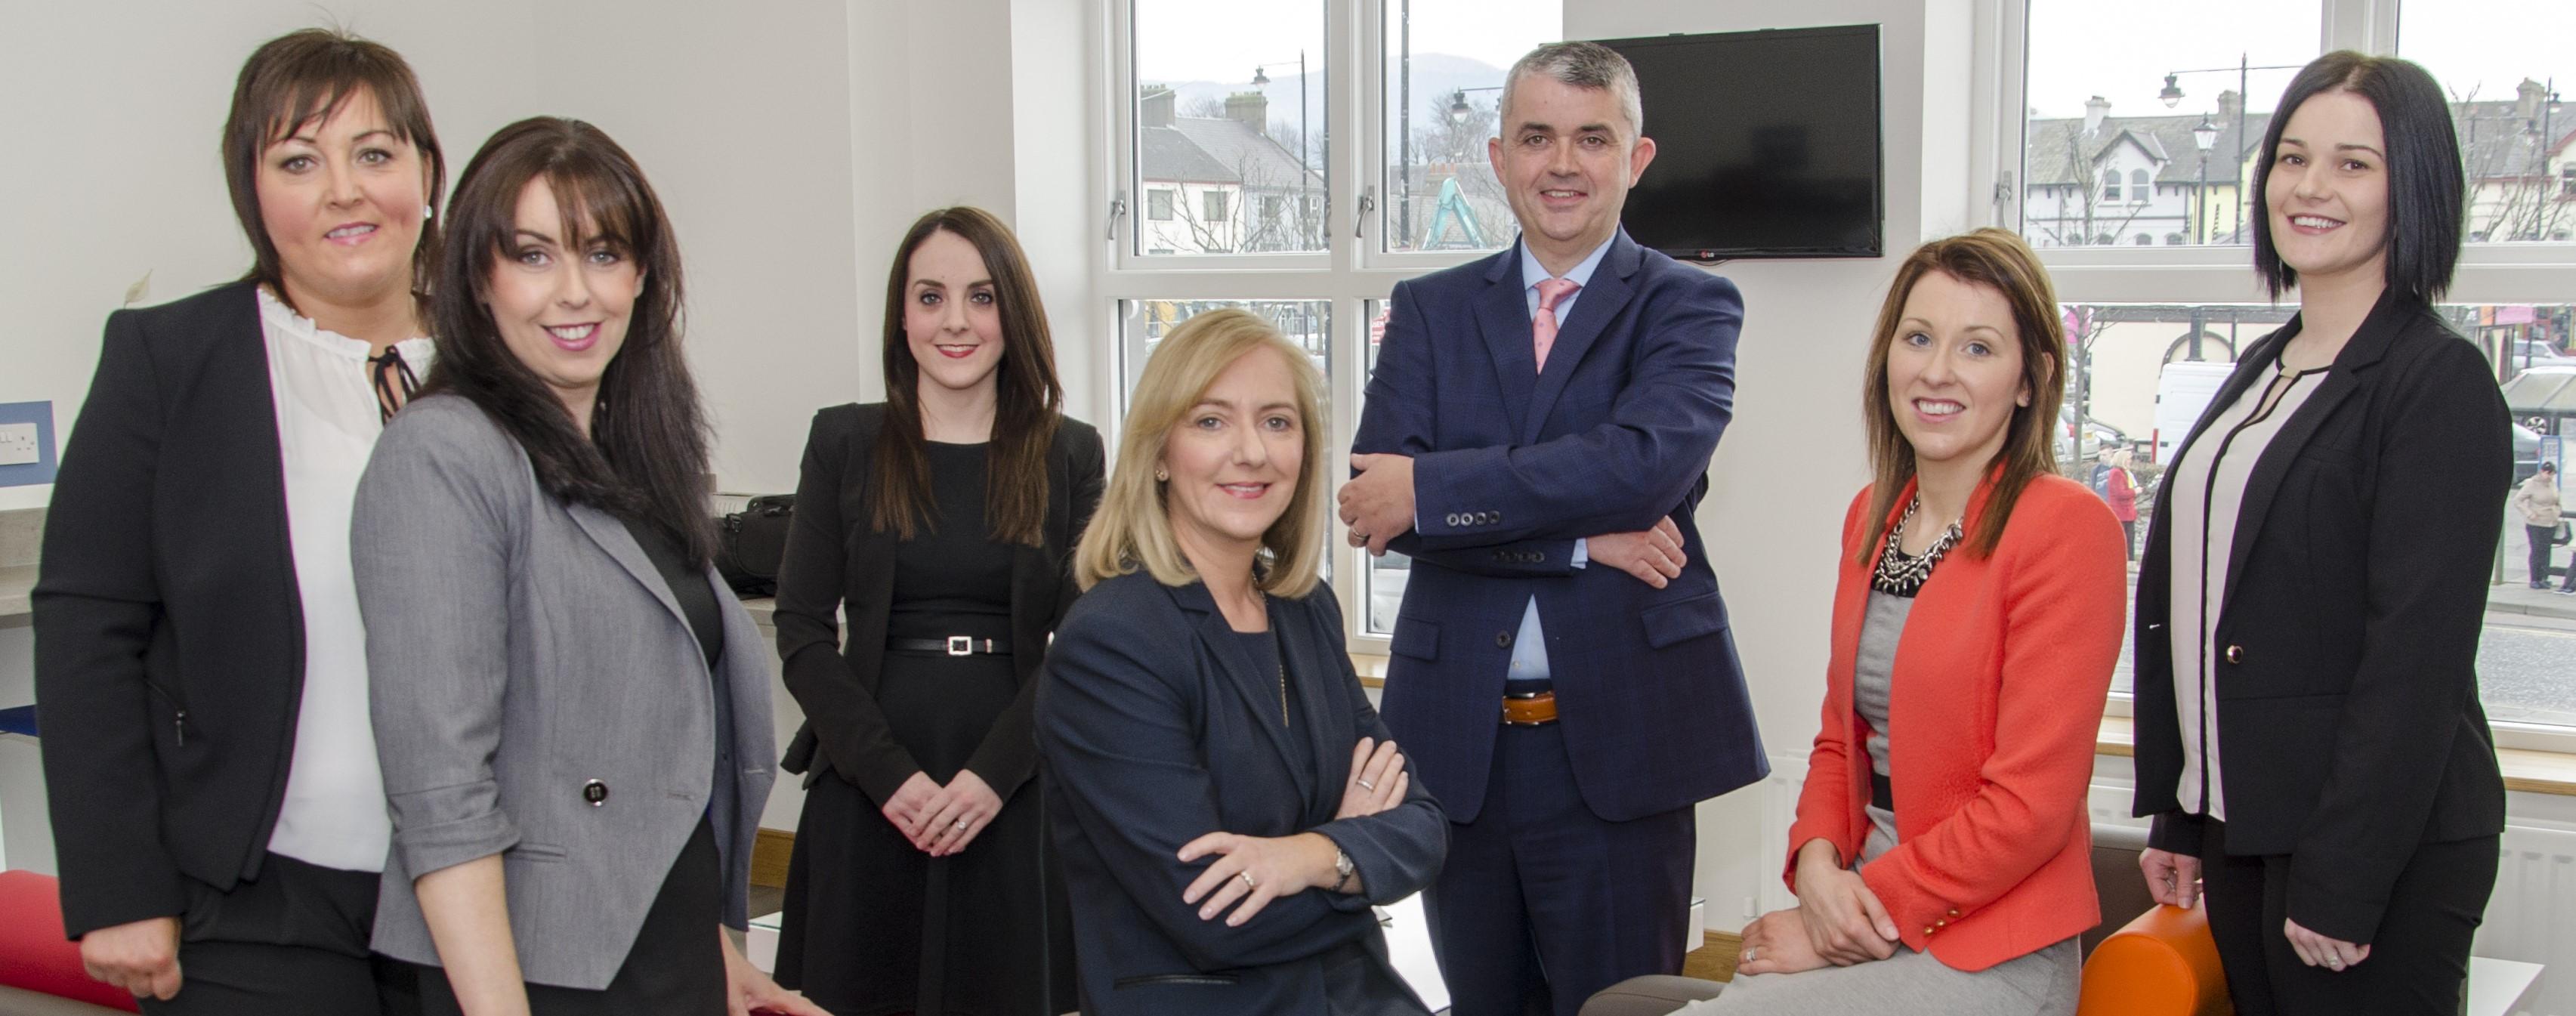 Personal injury experts Ireland